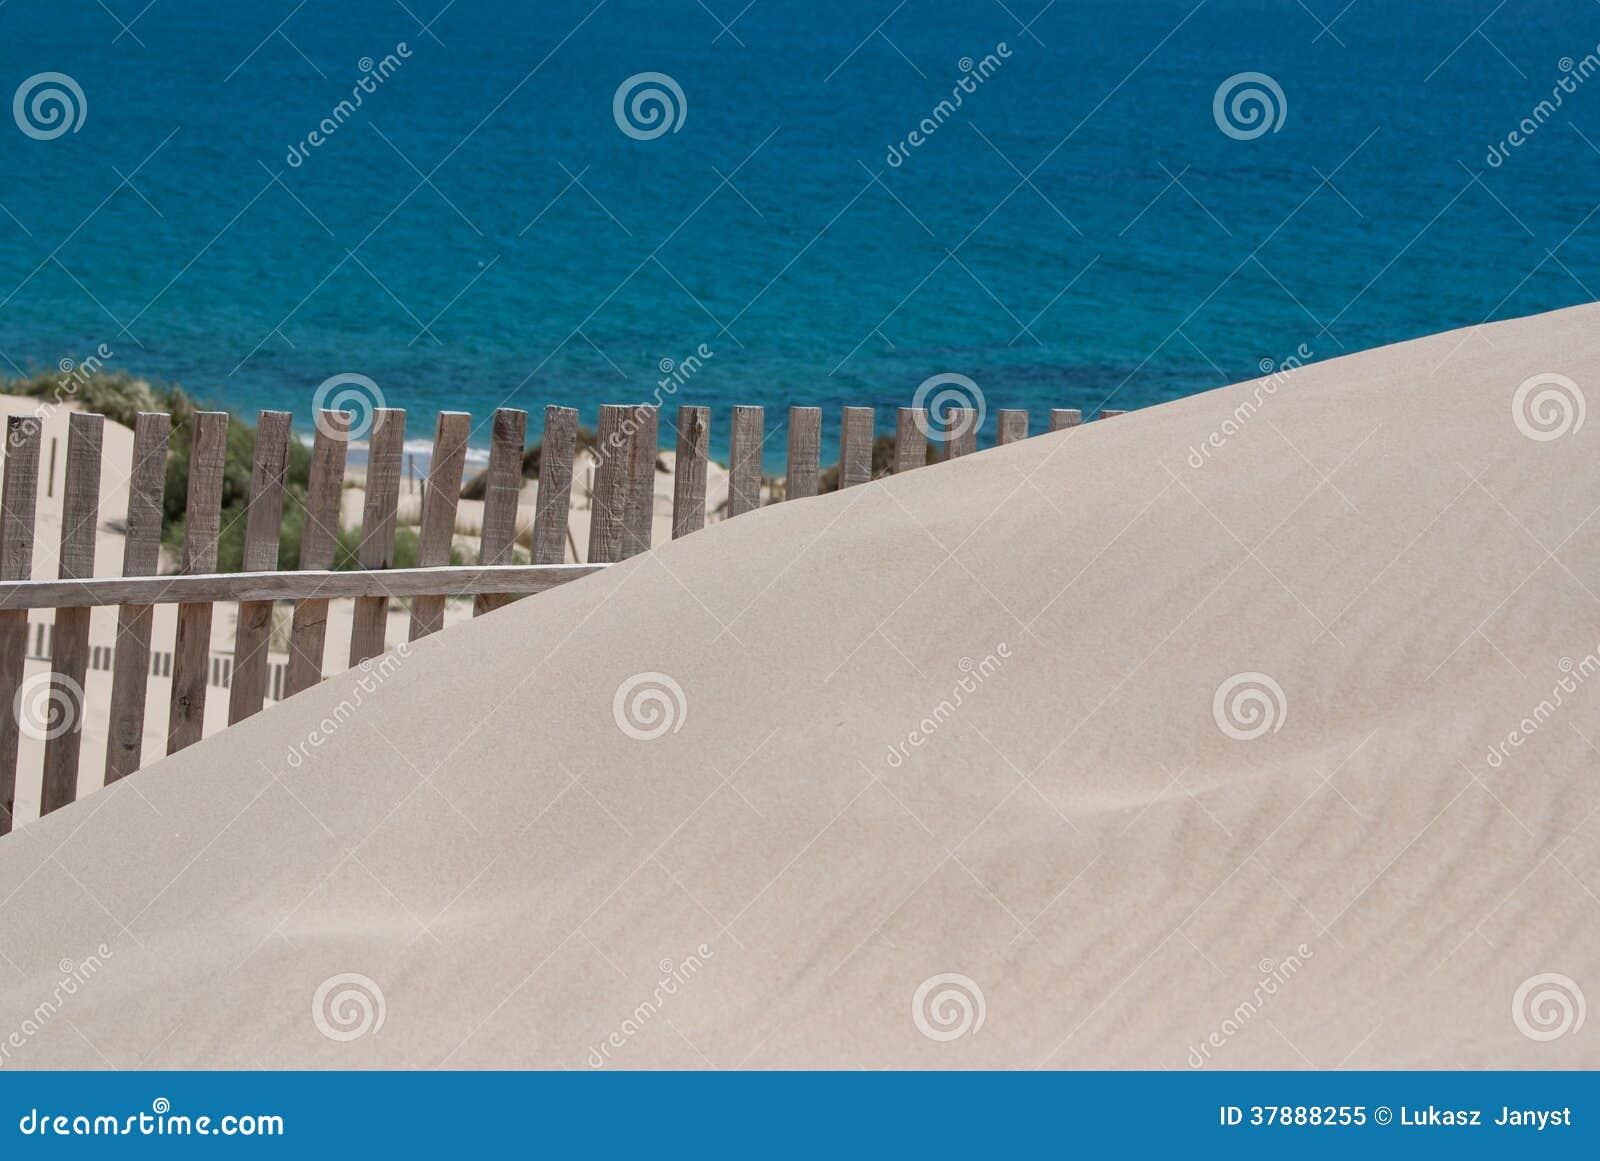 Houten omheiningen op verlaten strandduinen in Tarifa, Spanje